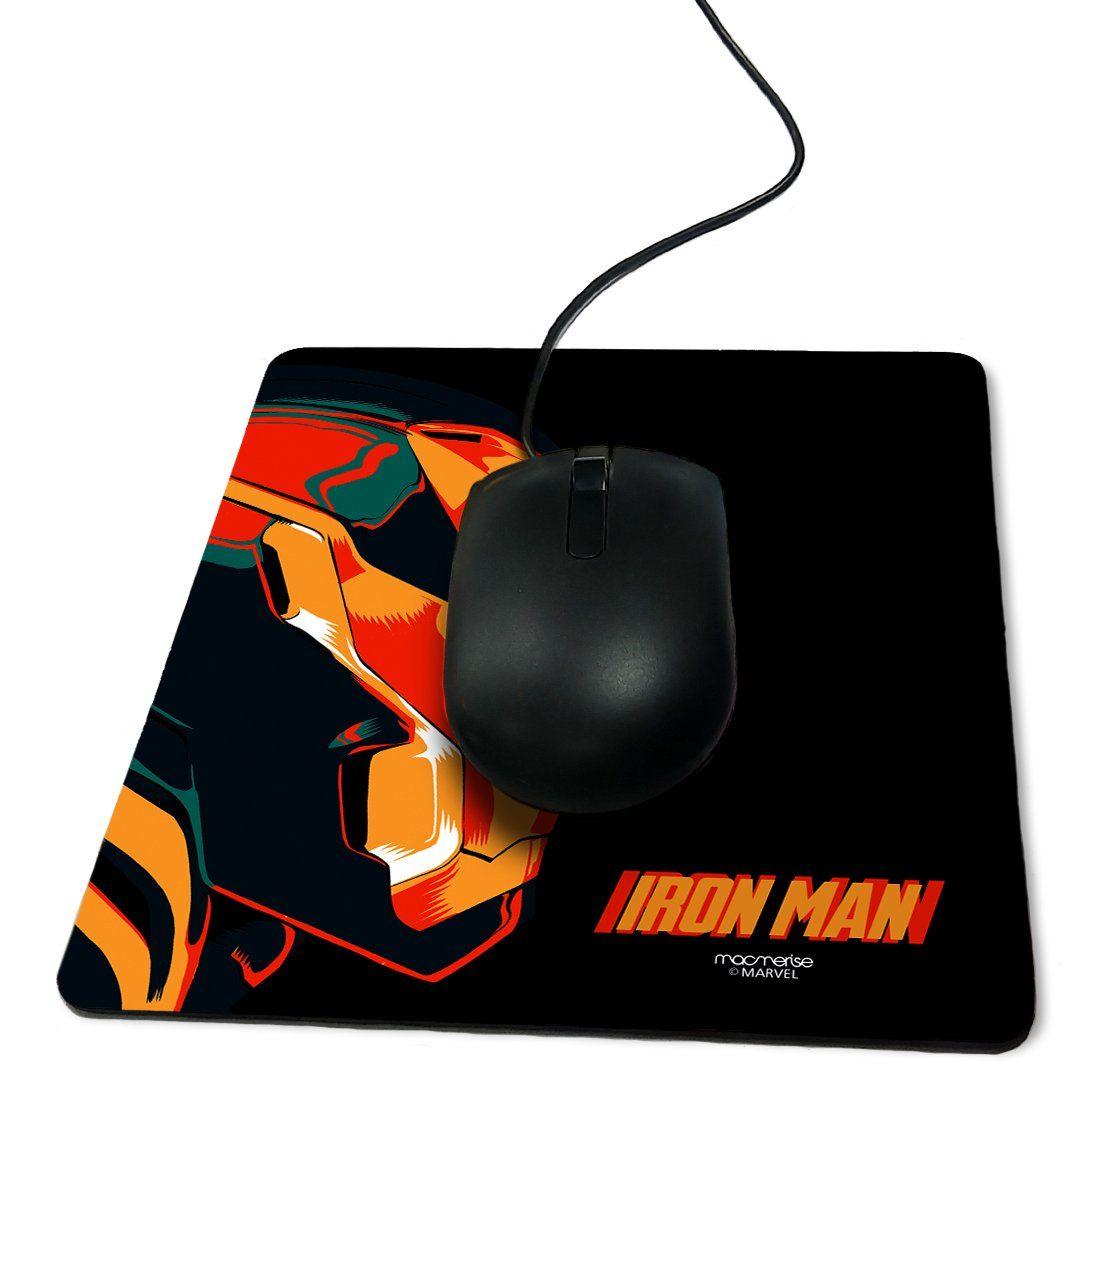 Illuminated Ironman - Macmerise Mouse Pad